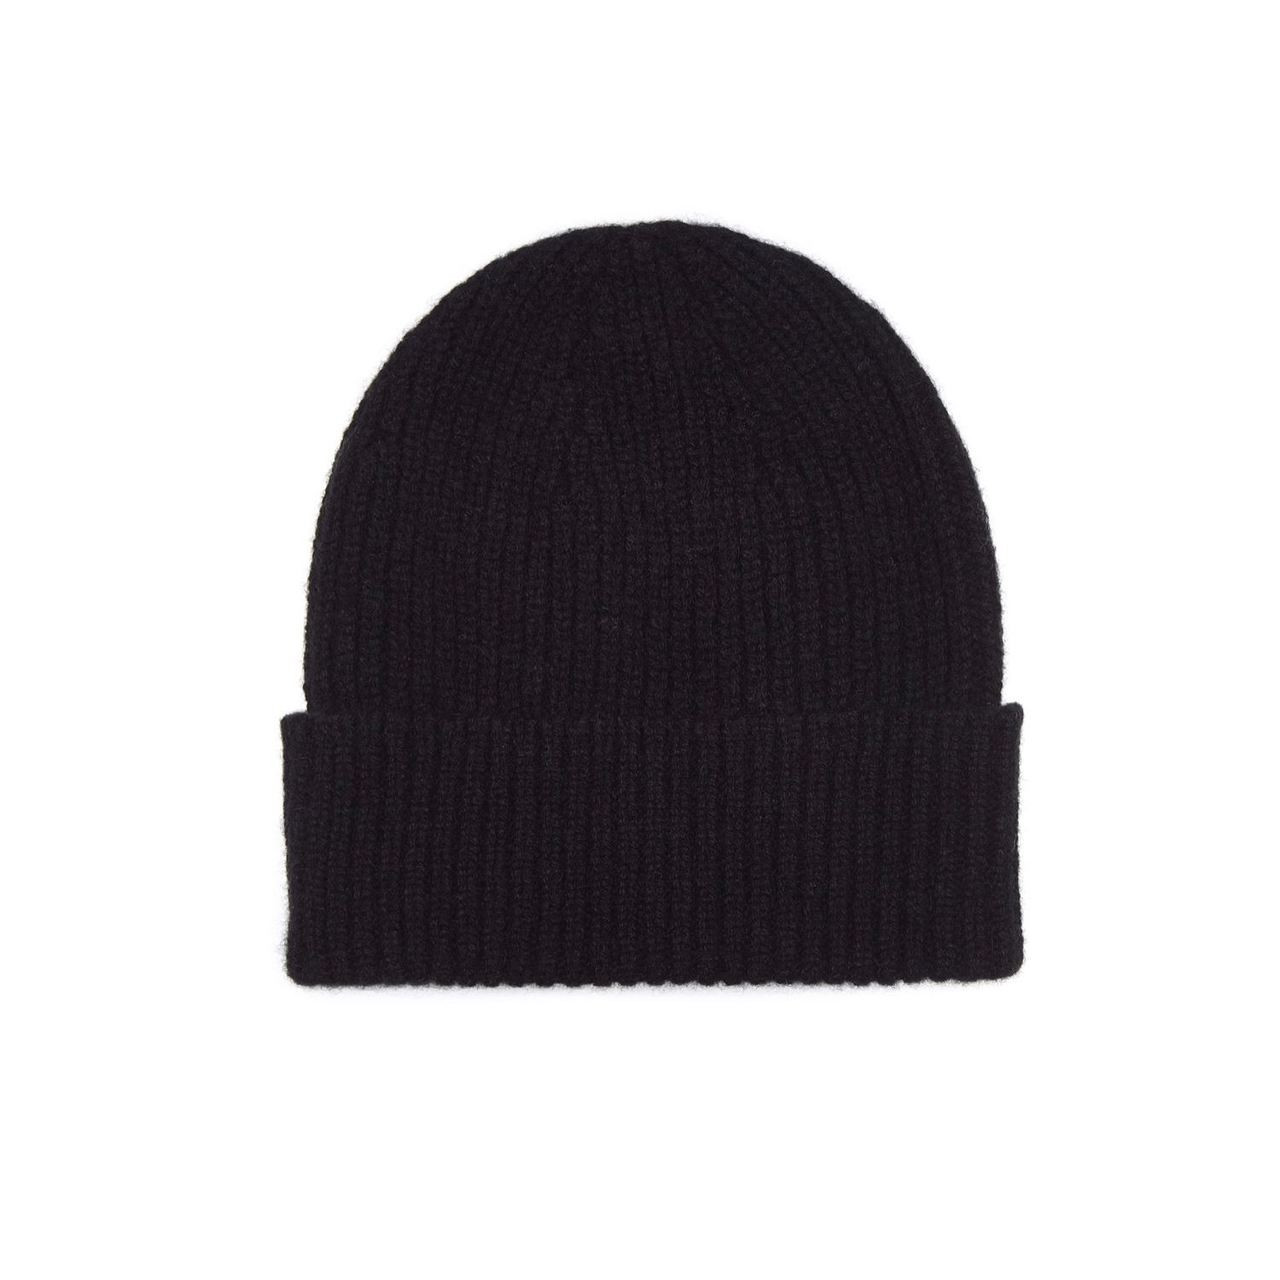 e0c9c1ab1a8 Cashmere Beanie Hat